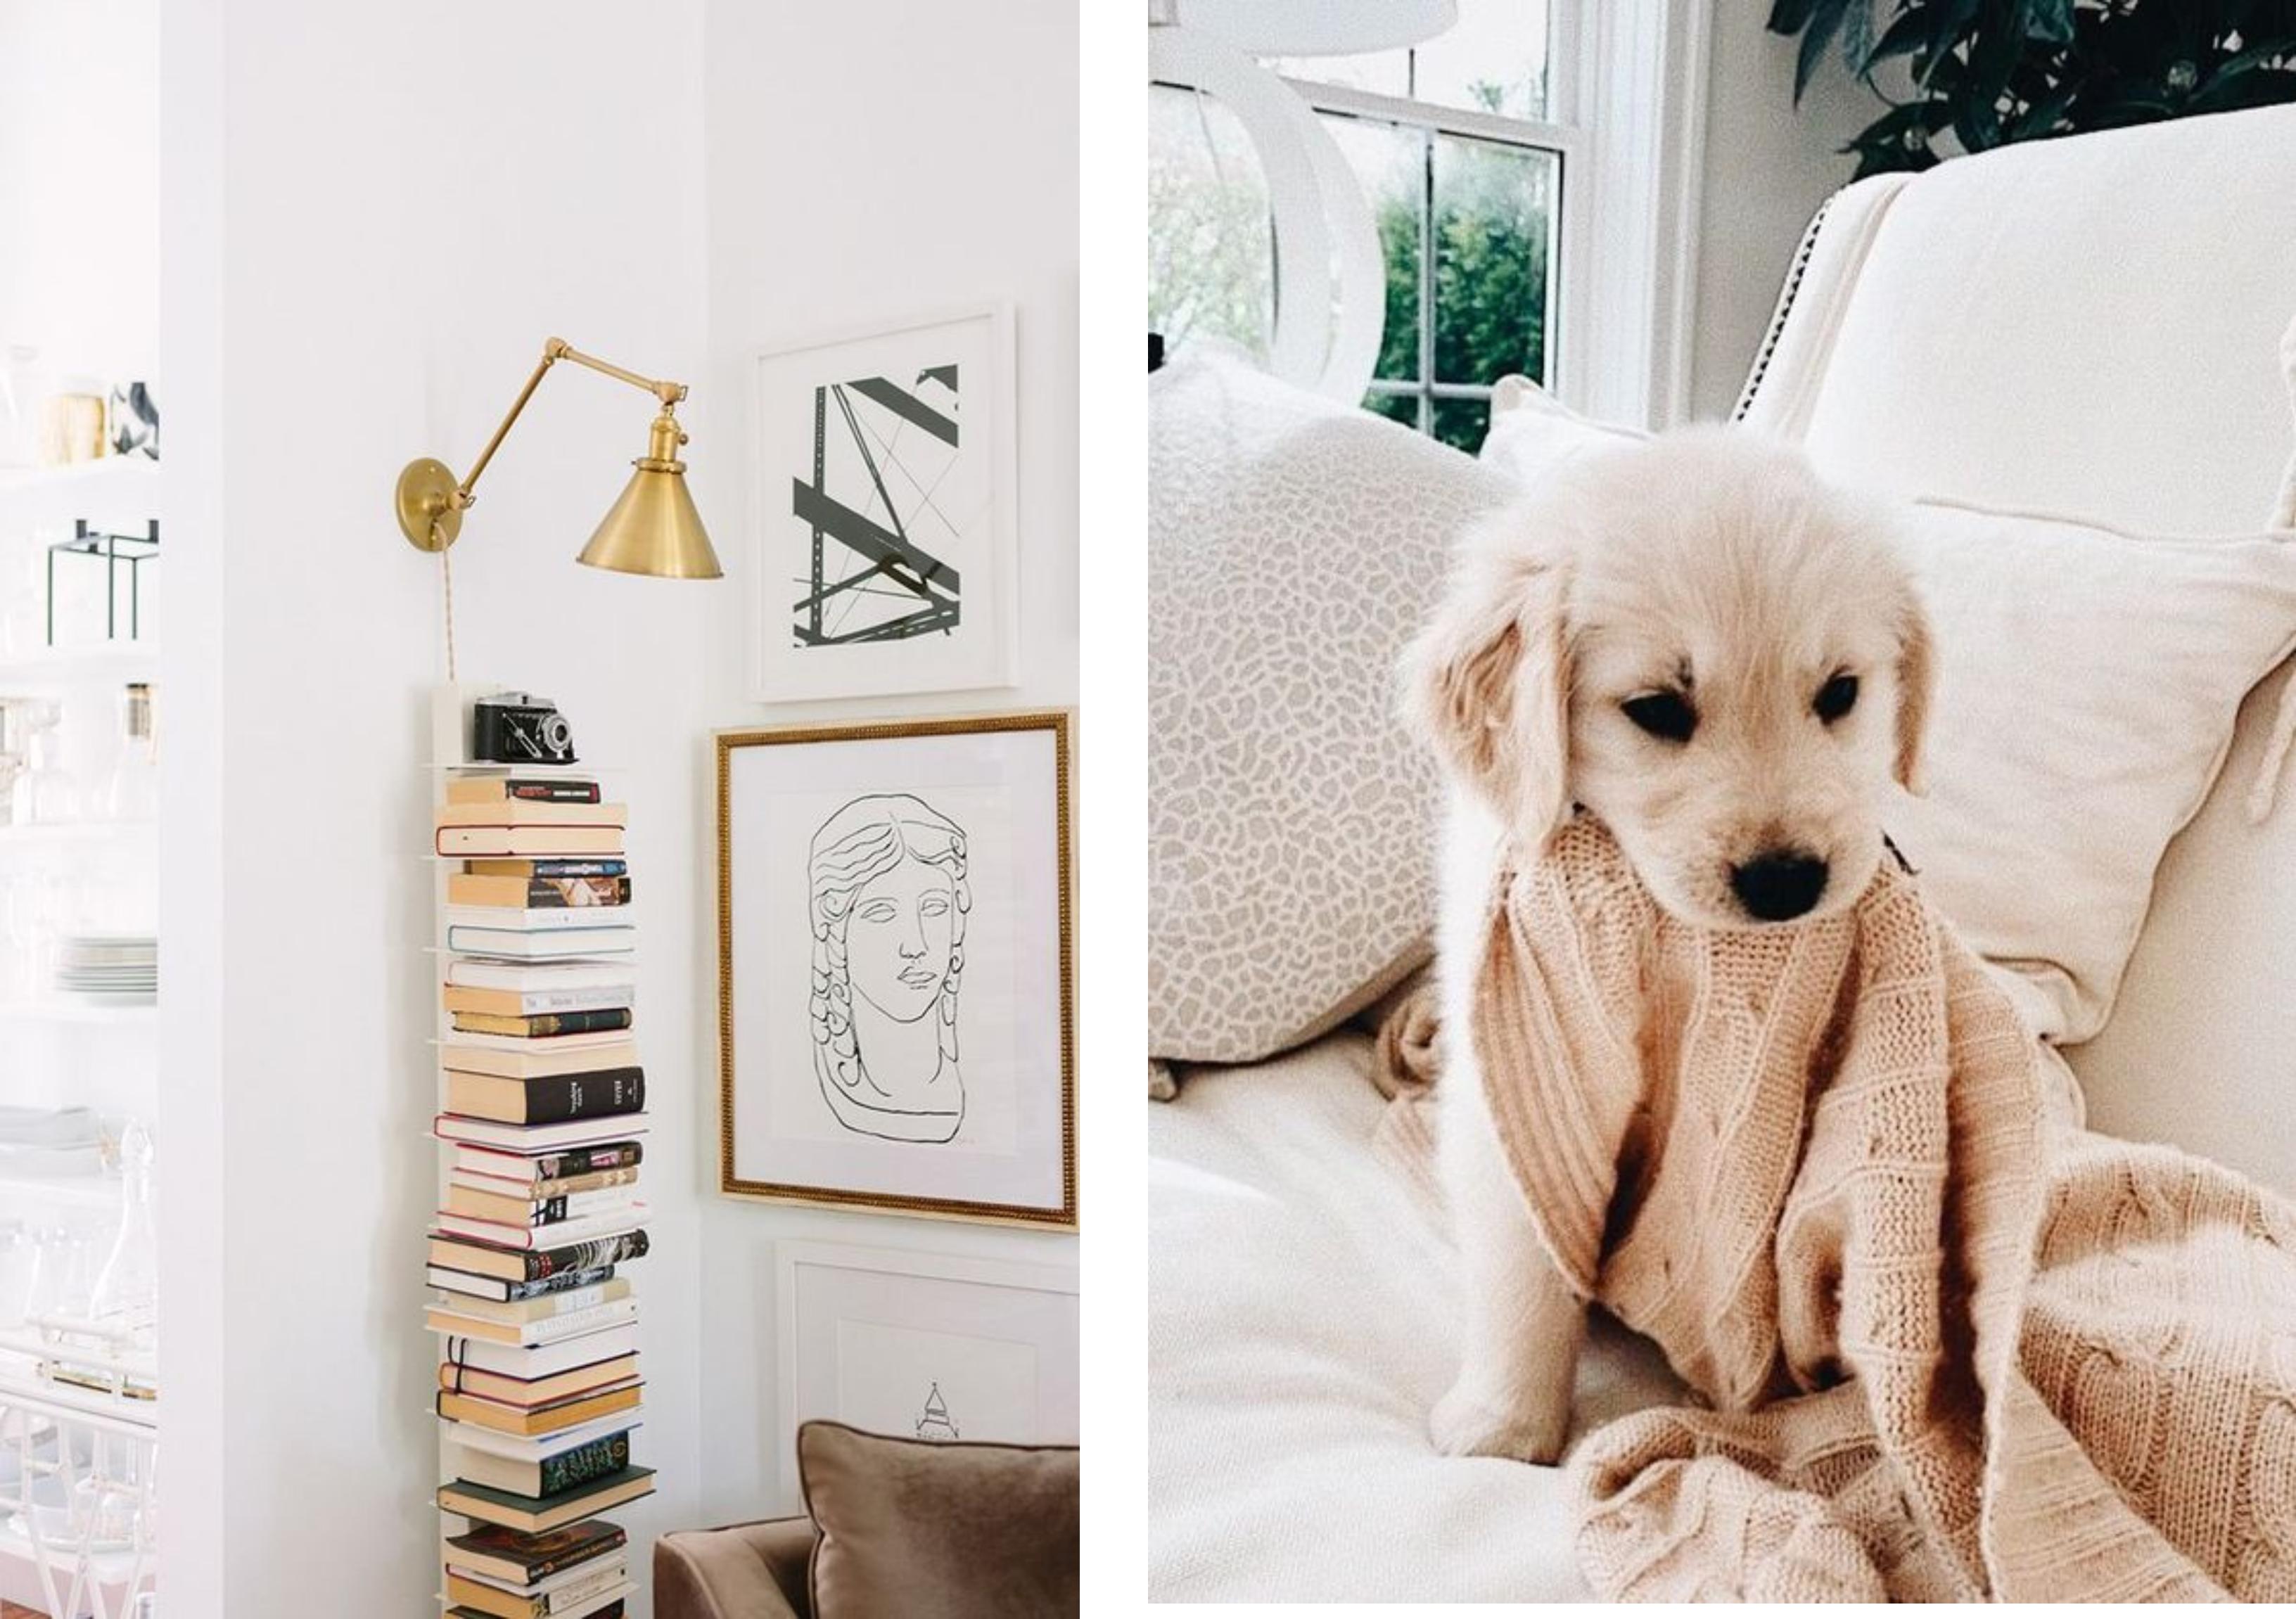 deka, knihy